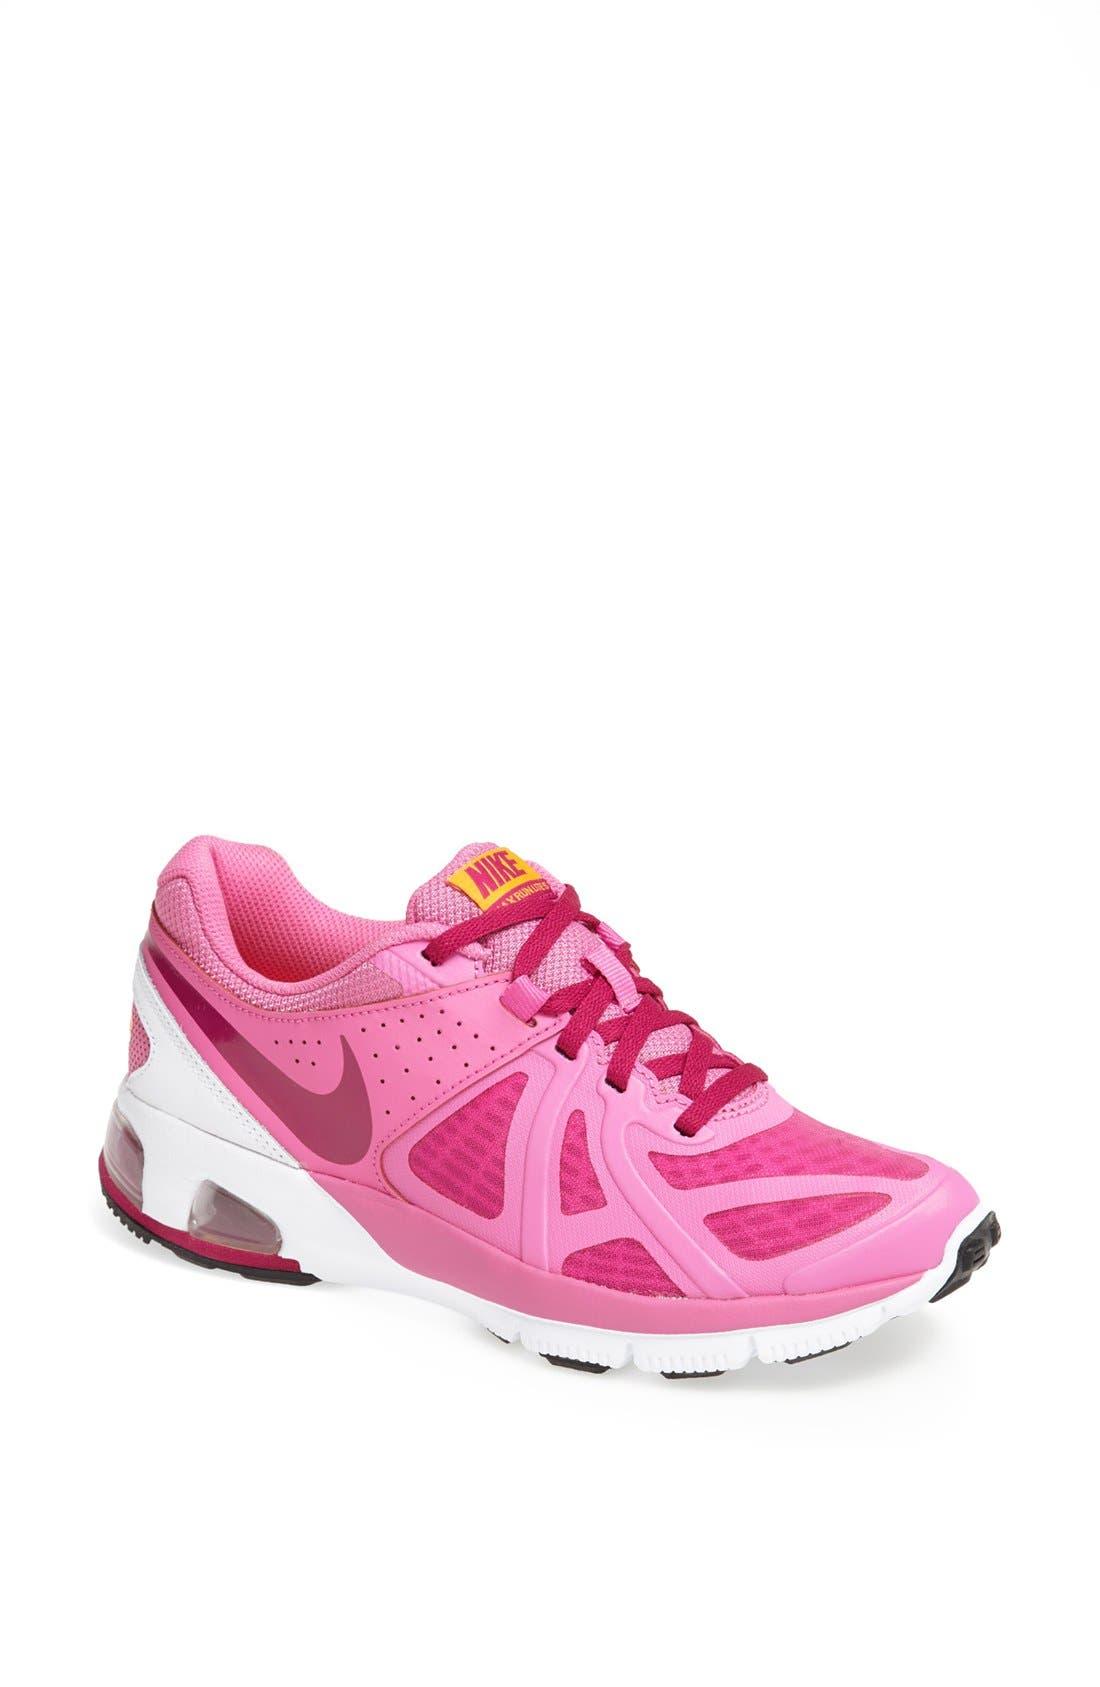 Alternate Image 1 Selected - Nike 'Air Max Run Lite 5' Running Shoe (Women)